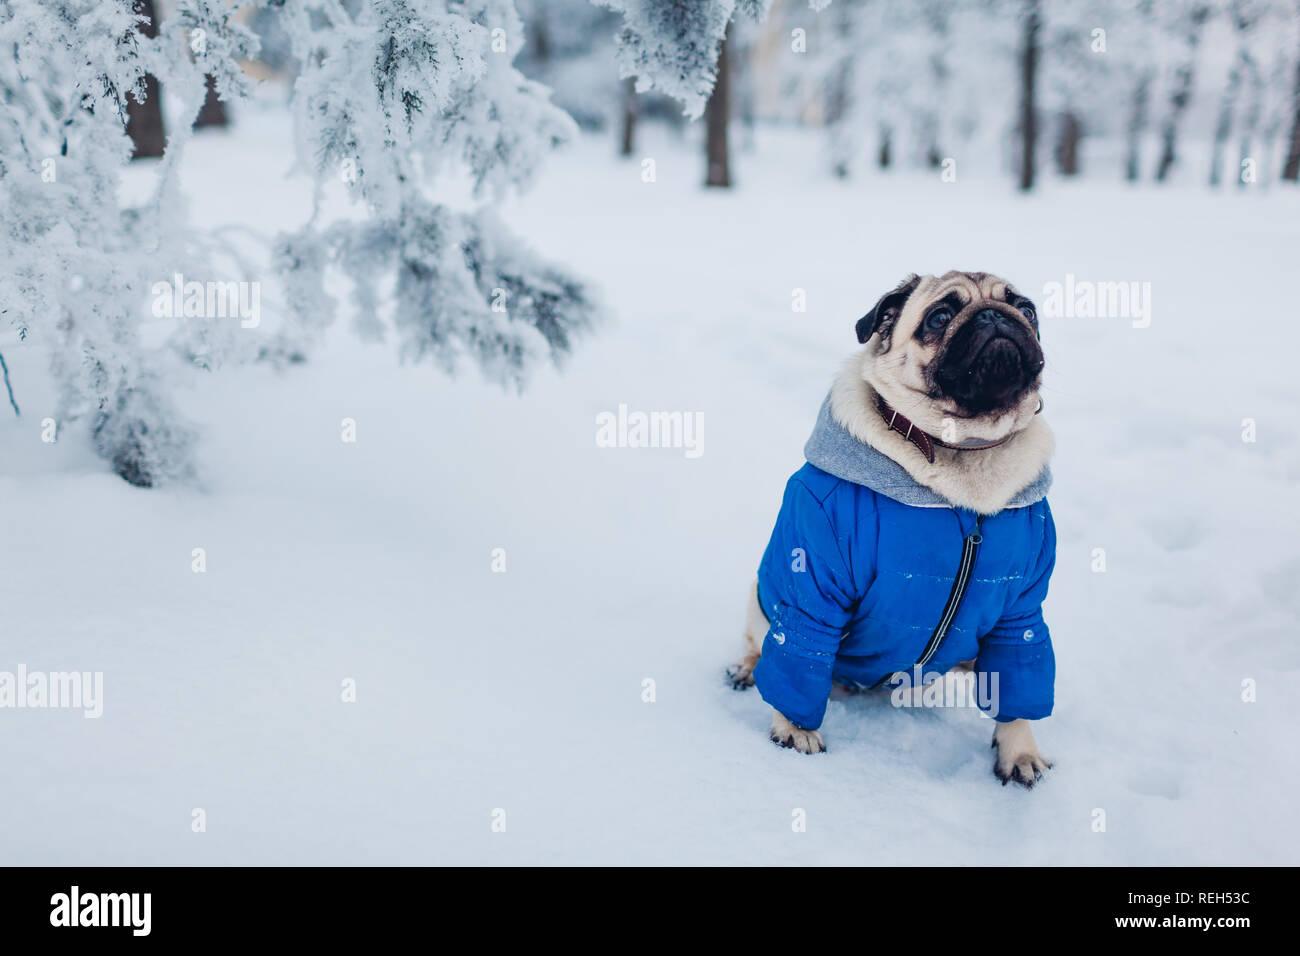 Pug Clothes Stock Photos & Pug Clothes Stock Images - Alamy